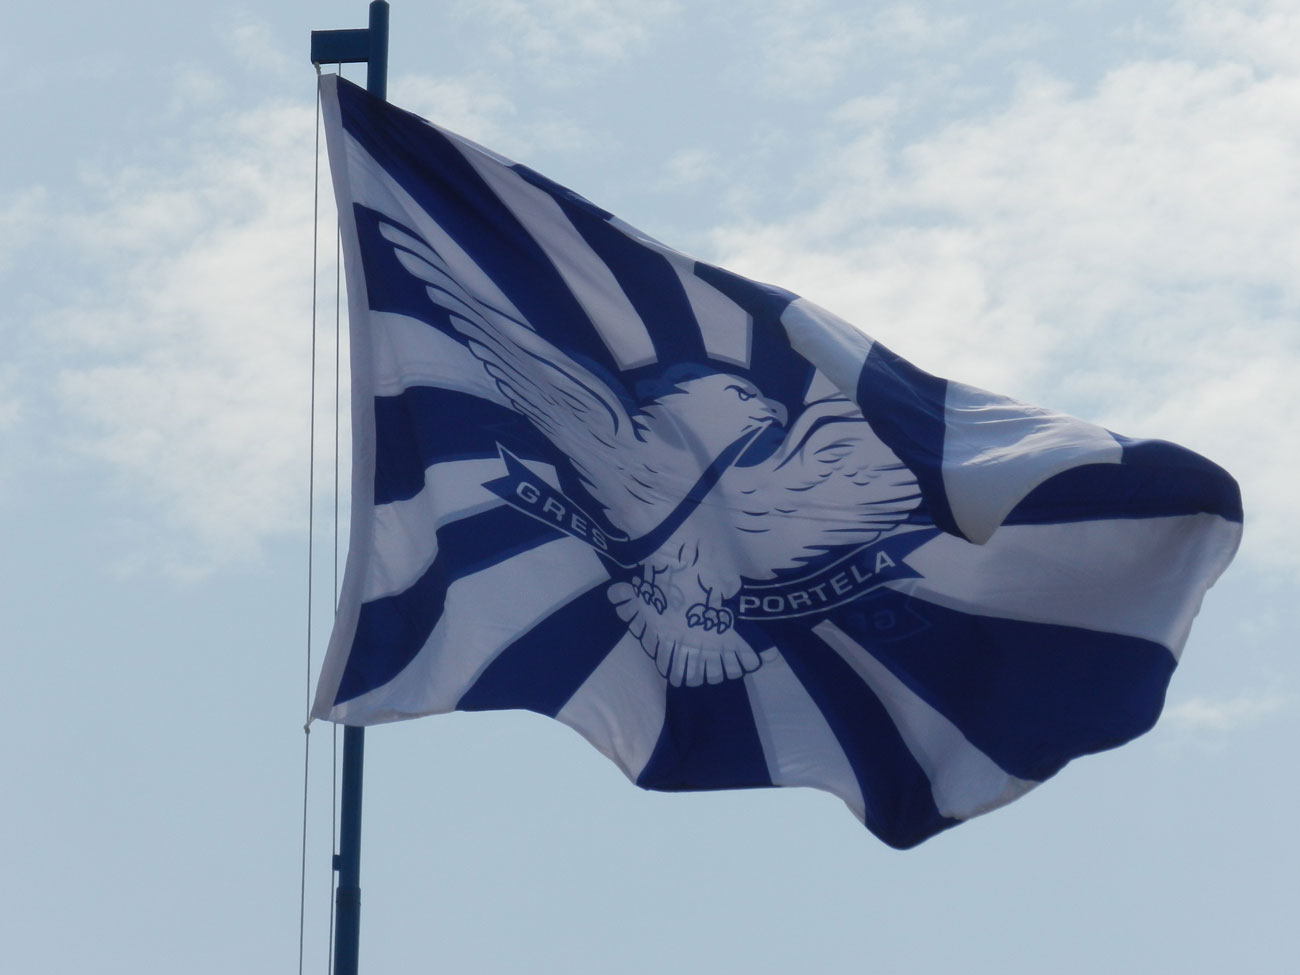 Portela hasteia bandeira na quadra